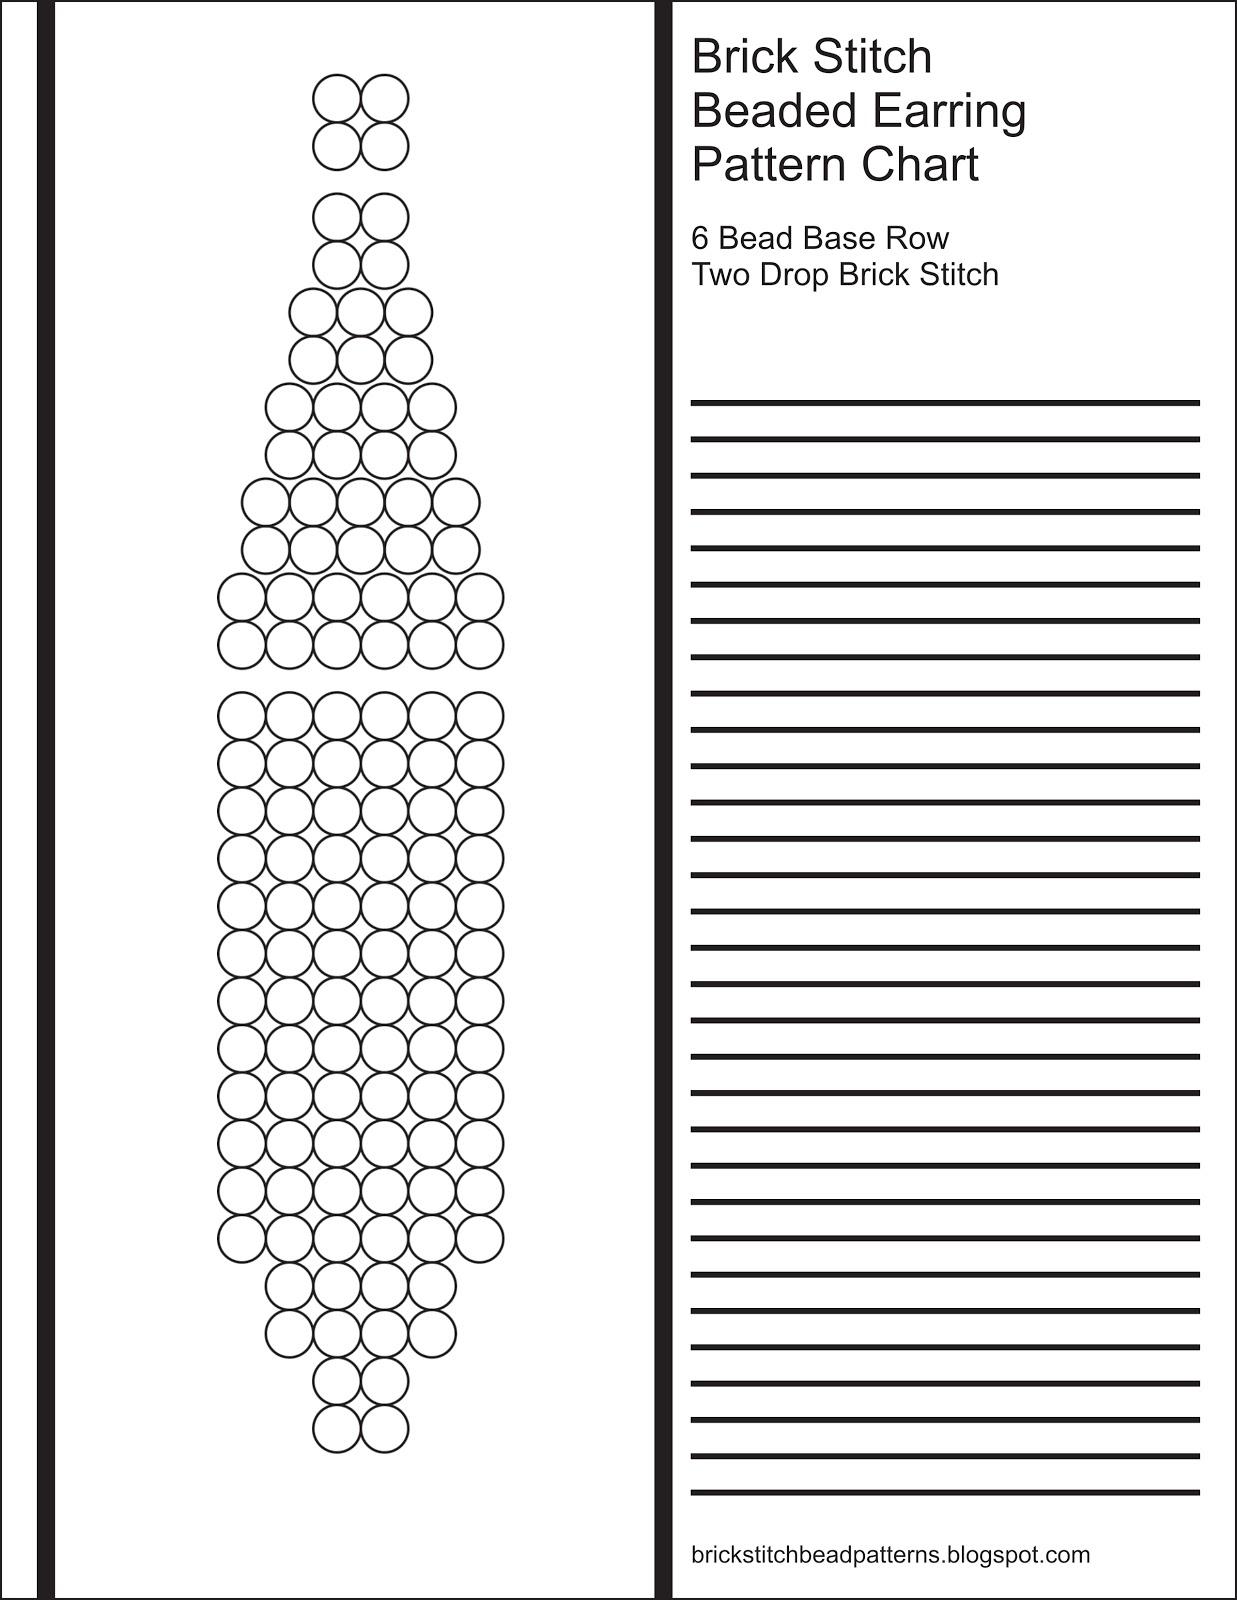 Brick Stitch Bead Patterns Journal 6 Bead Base Row 2 Drop